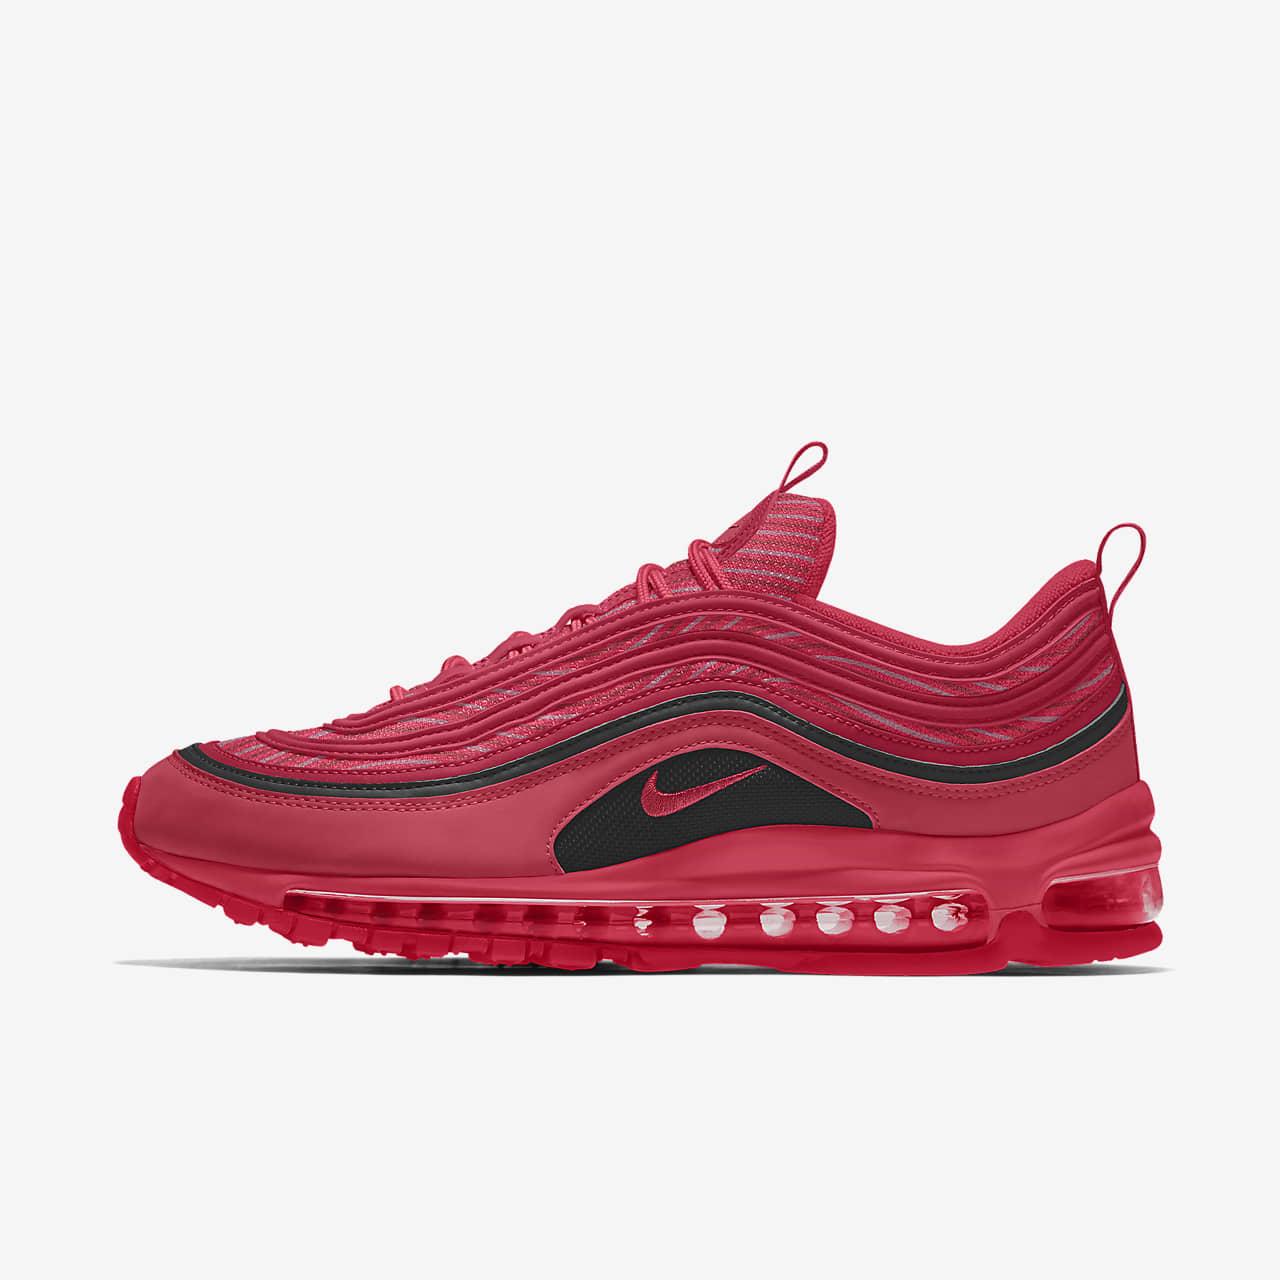 Nike Air Max 97 By You Custom Shoe